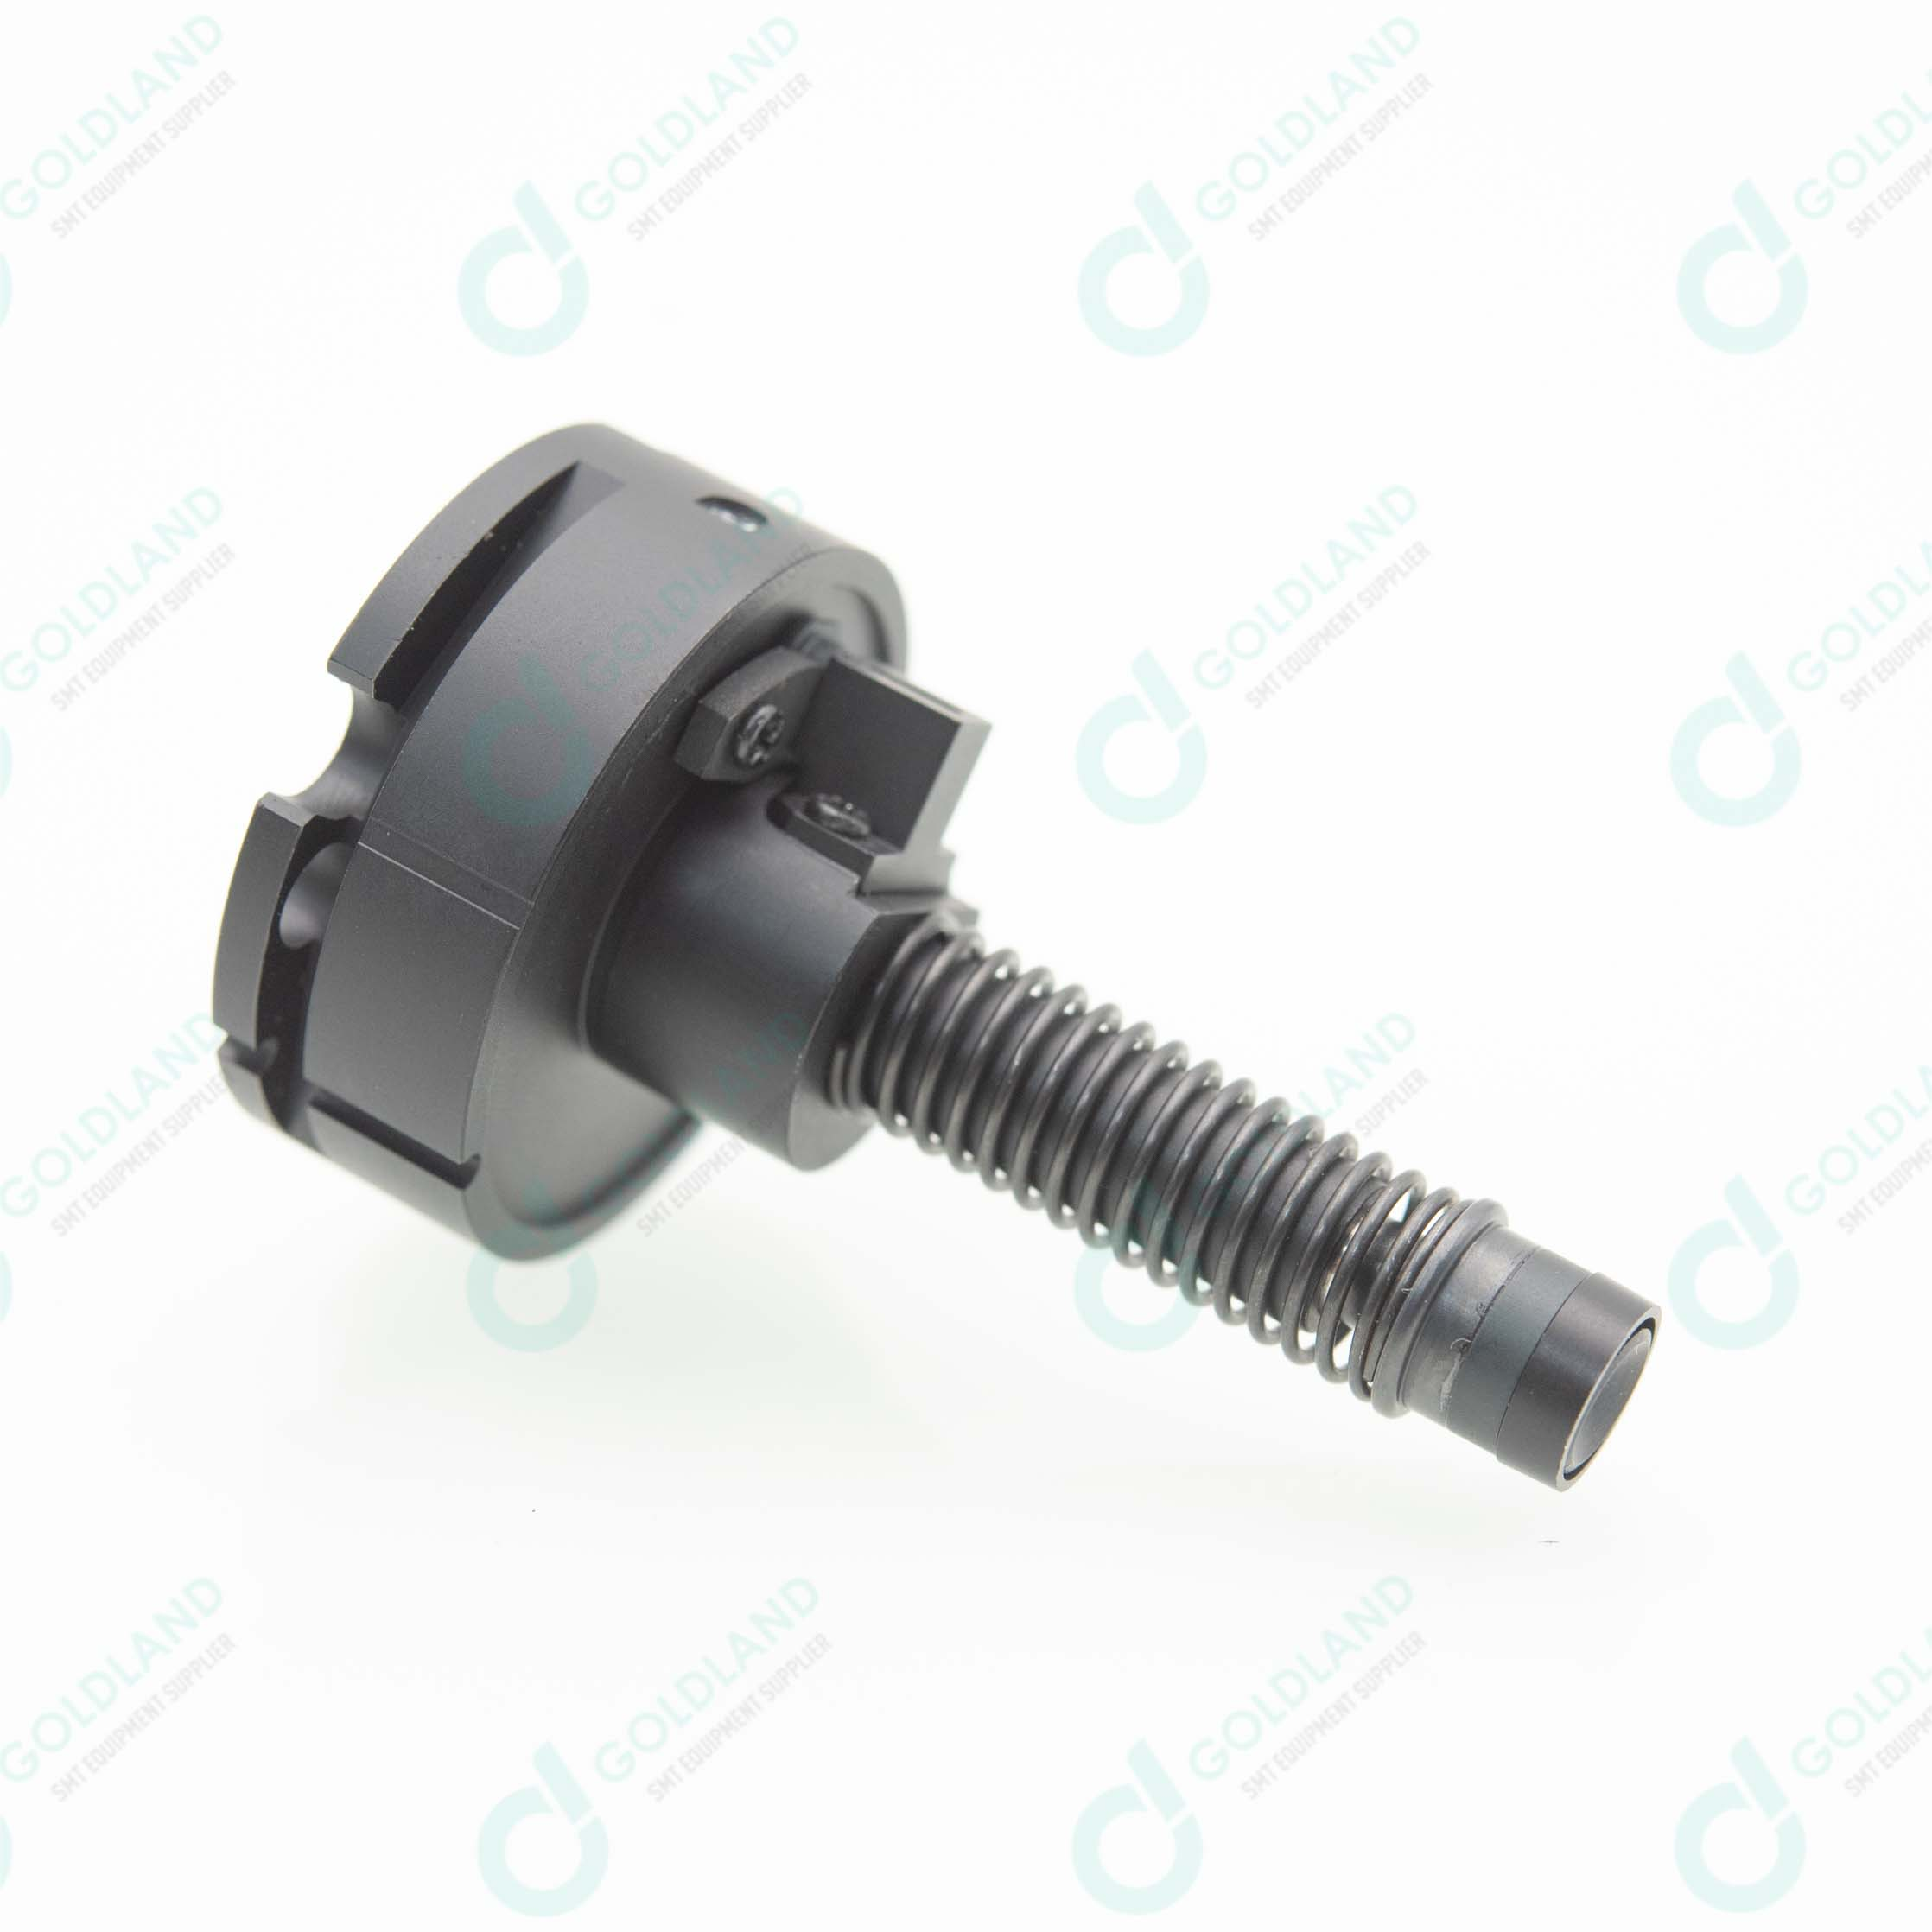 2AGKNL018300 FUJI Nozzle dia. 7.0G with rubber pad for FUJI smt machine parts